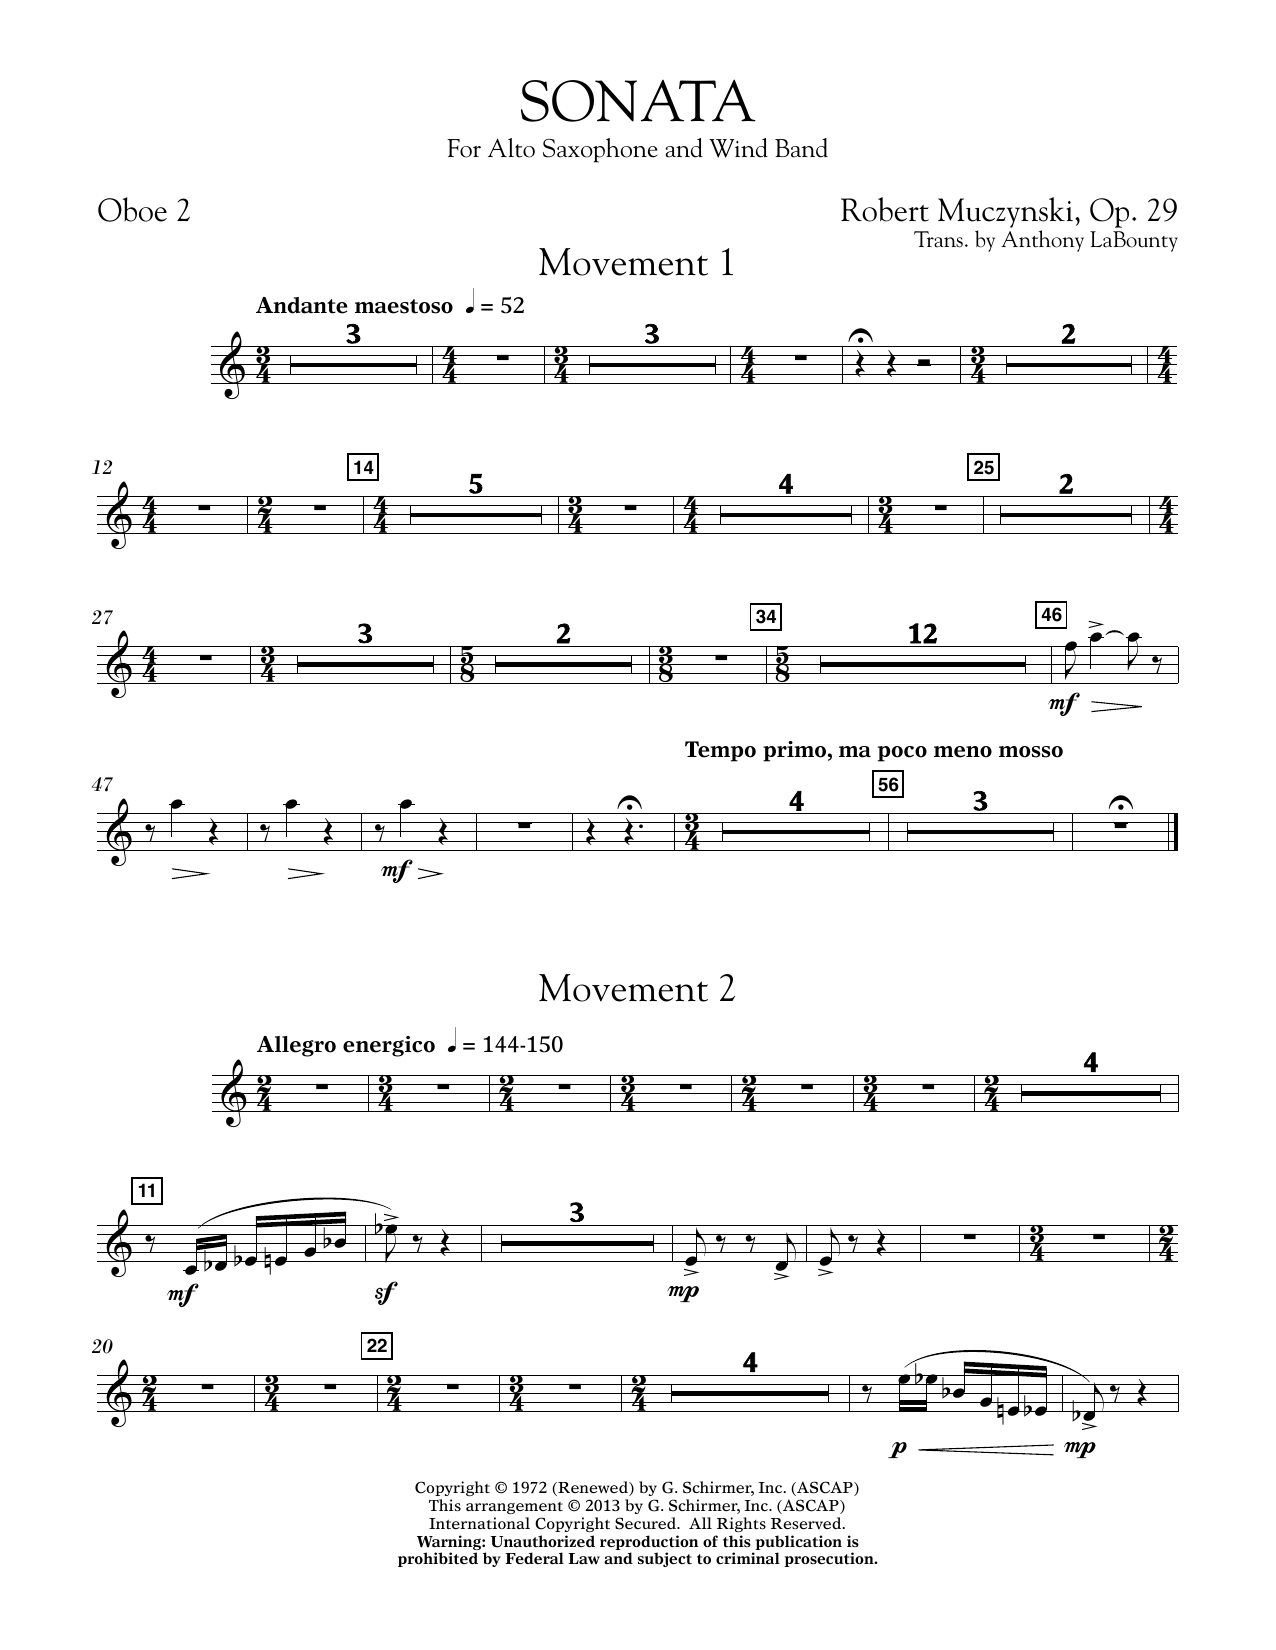 Sonata for Alto Saxophone, Op. 29 - Oboe 2 (Concert Band)